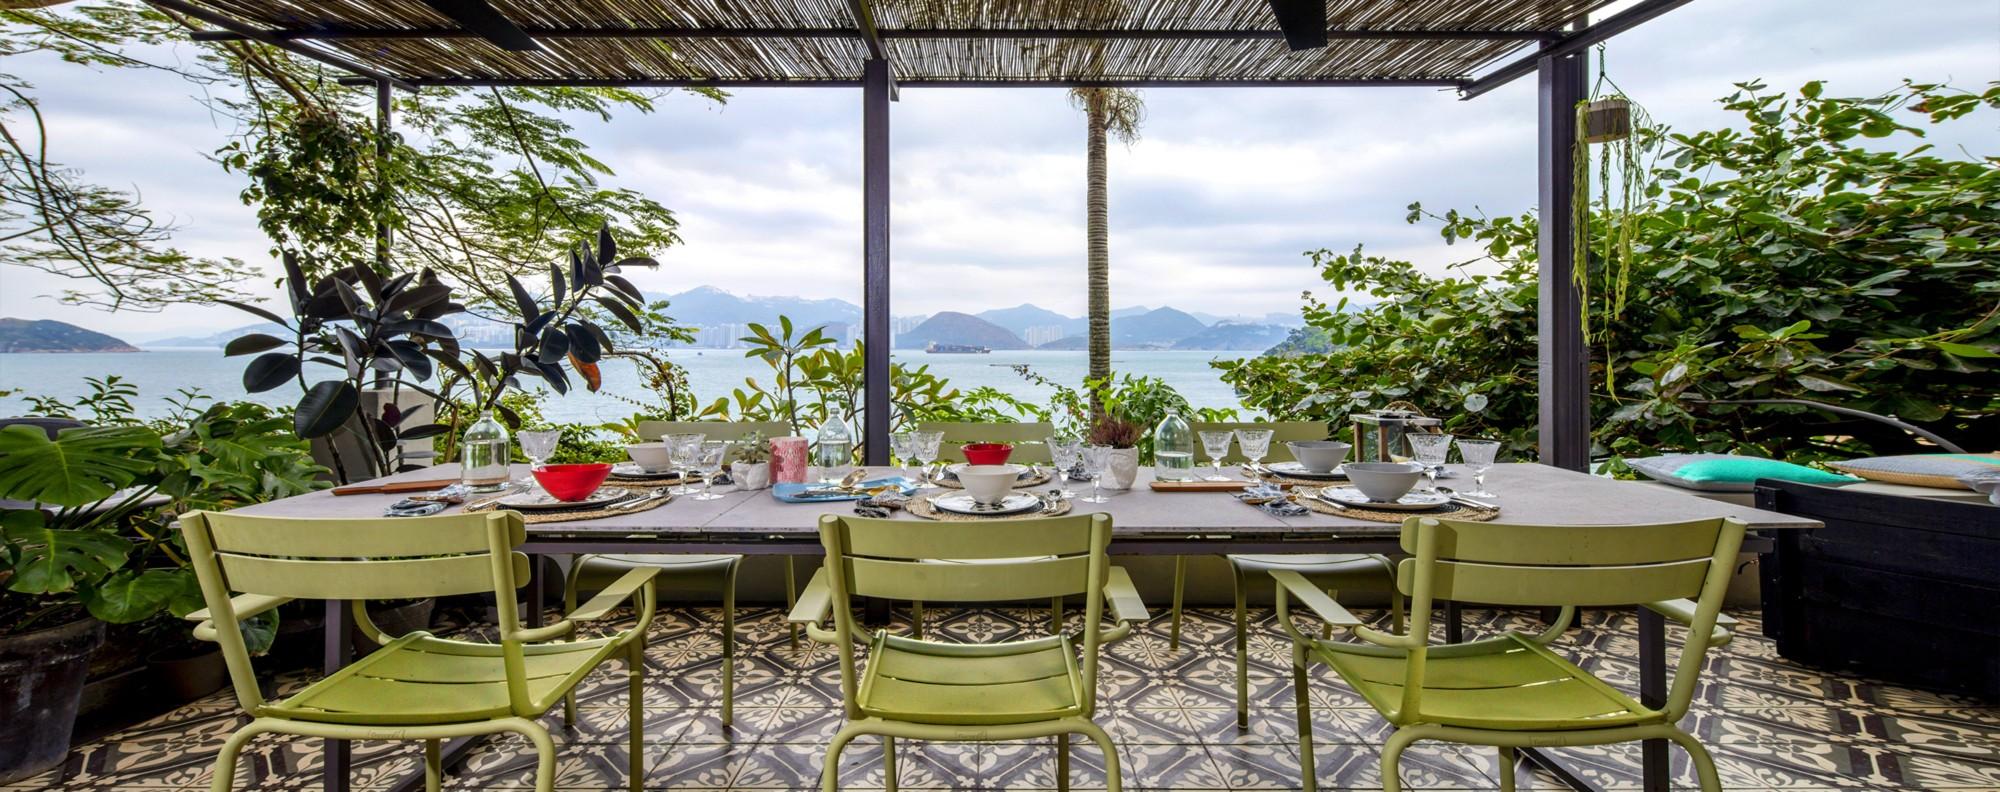 The Lamma Island home boasts incredible views.